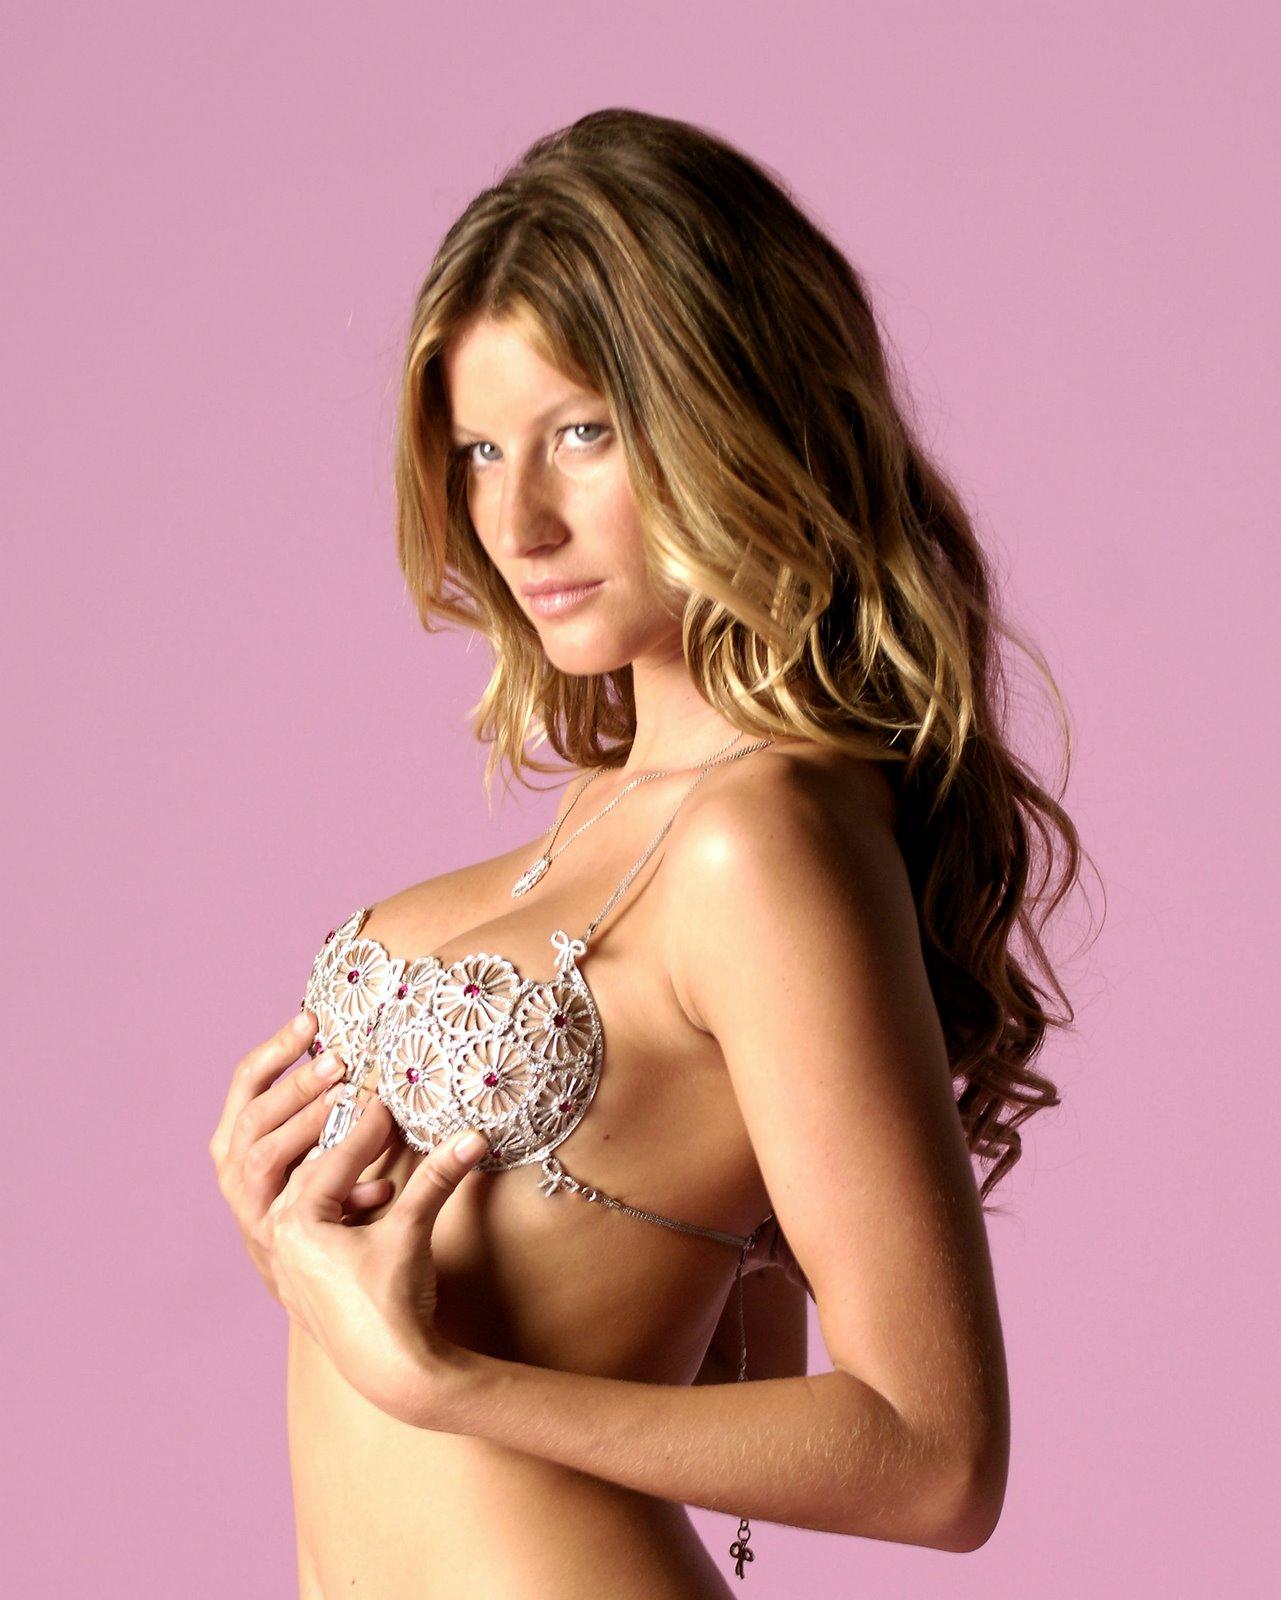 Gisele Bundchen in a sparkly bra